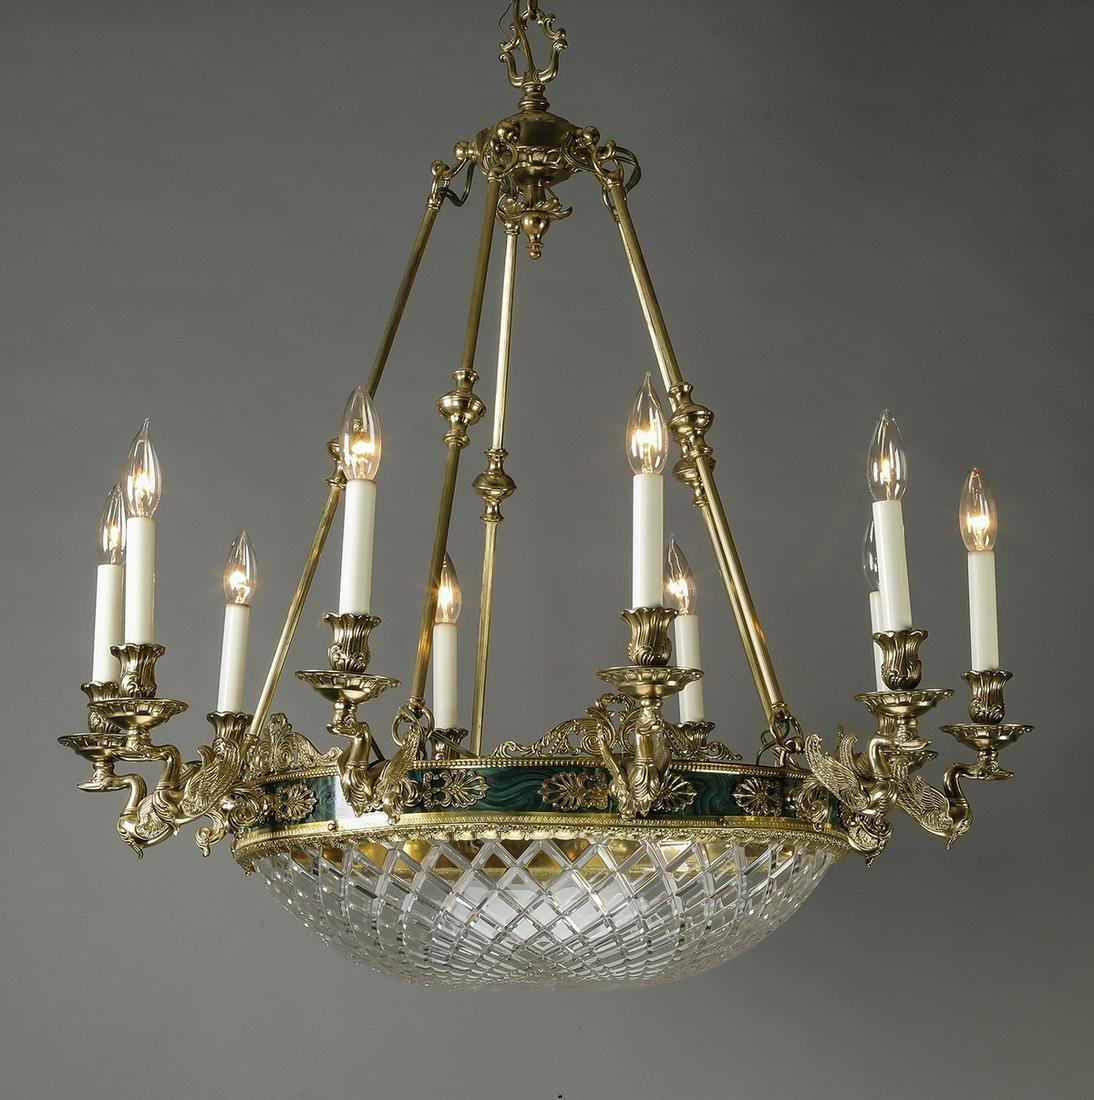 Italian Empire style ten-light bronze chandelier